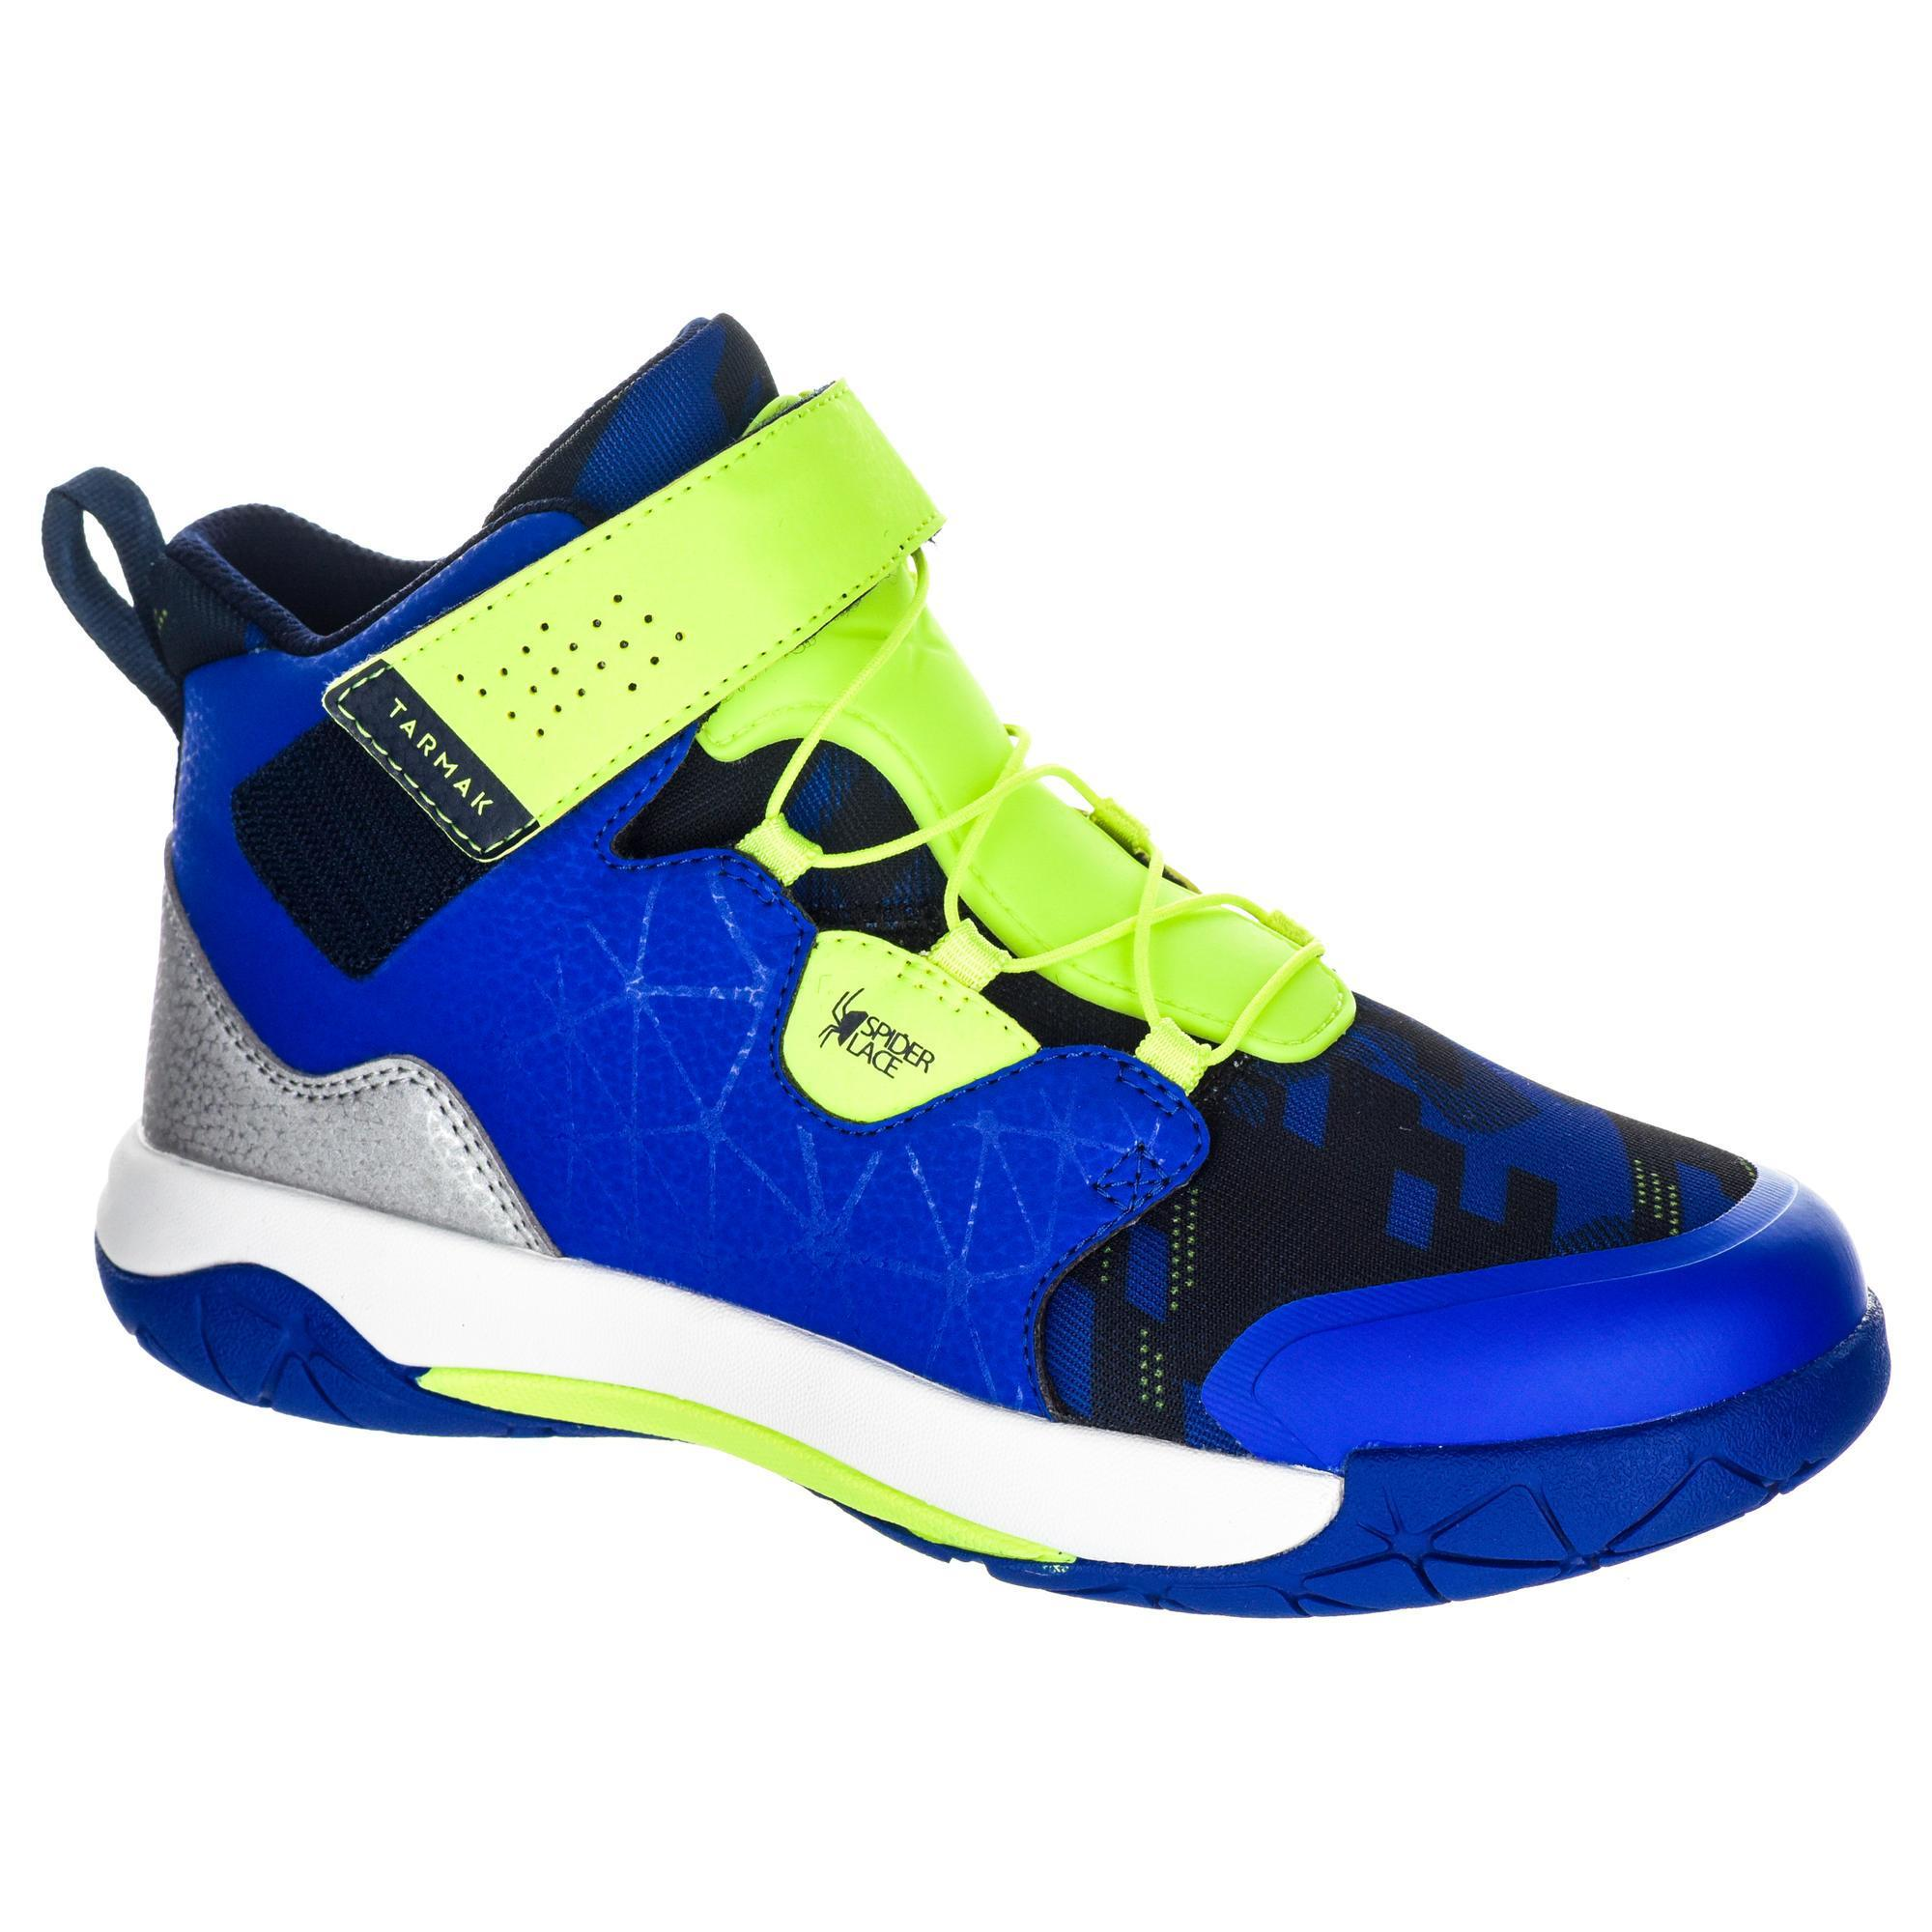 2587991 Tarmak Basketbalschoenen Spider Lace dames halfgevorderden blauw geel